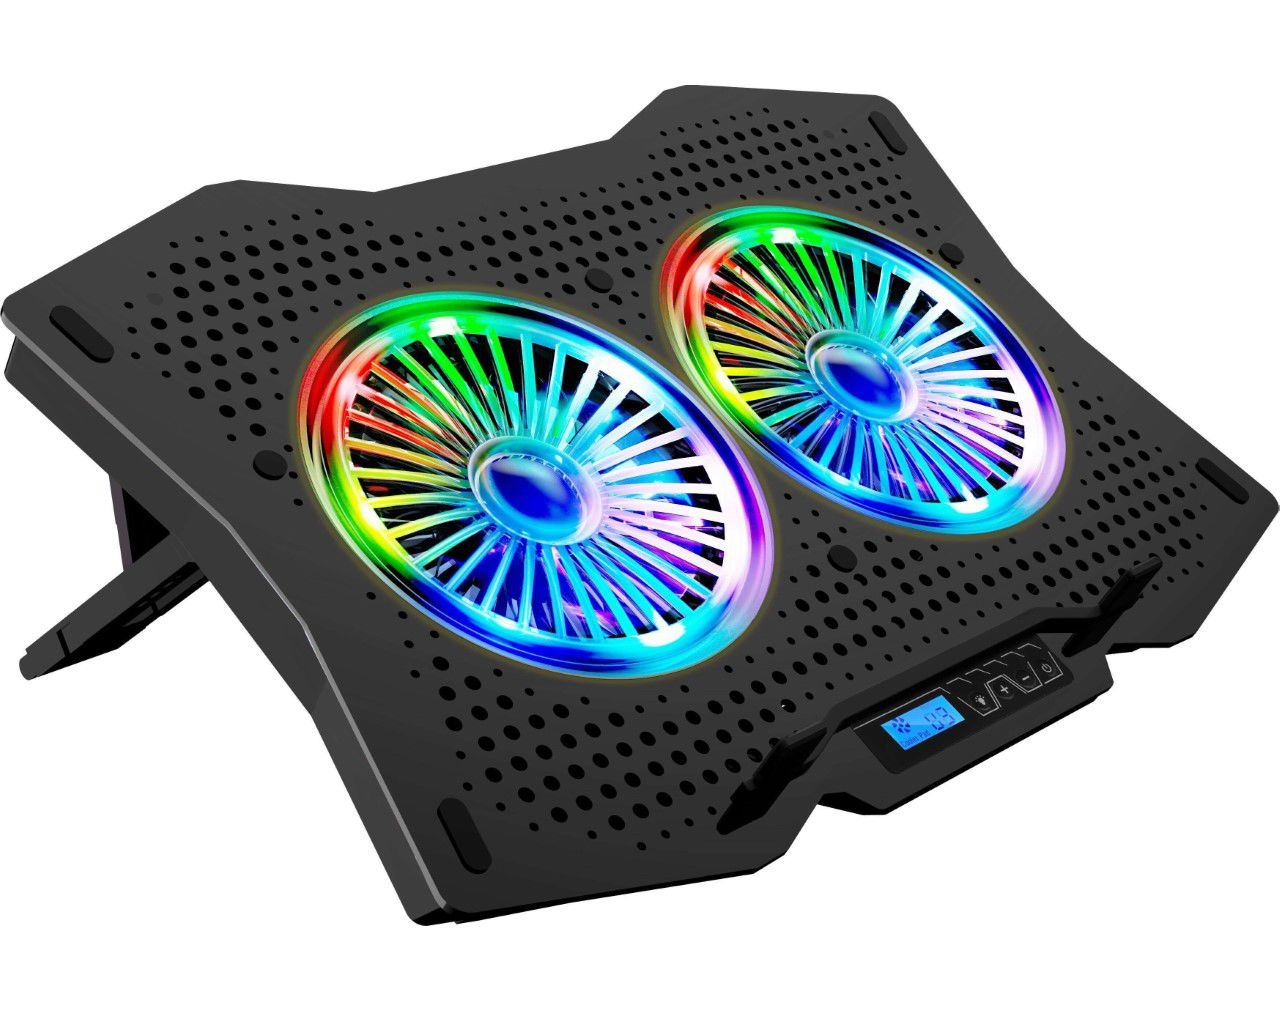 Rampage AD-RC9 TORNADO Siyah 115 -115 -15mm (2 adet)Fanlı 10''-18'' RGB Işıklı Notebook Soğutucu Stand